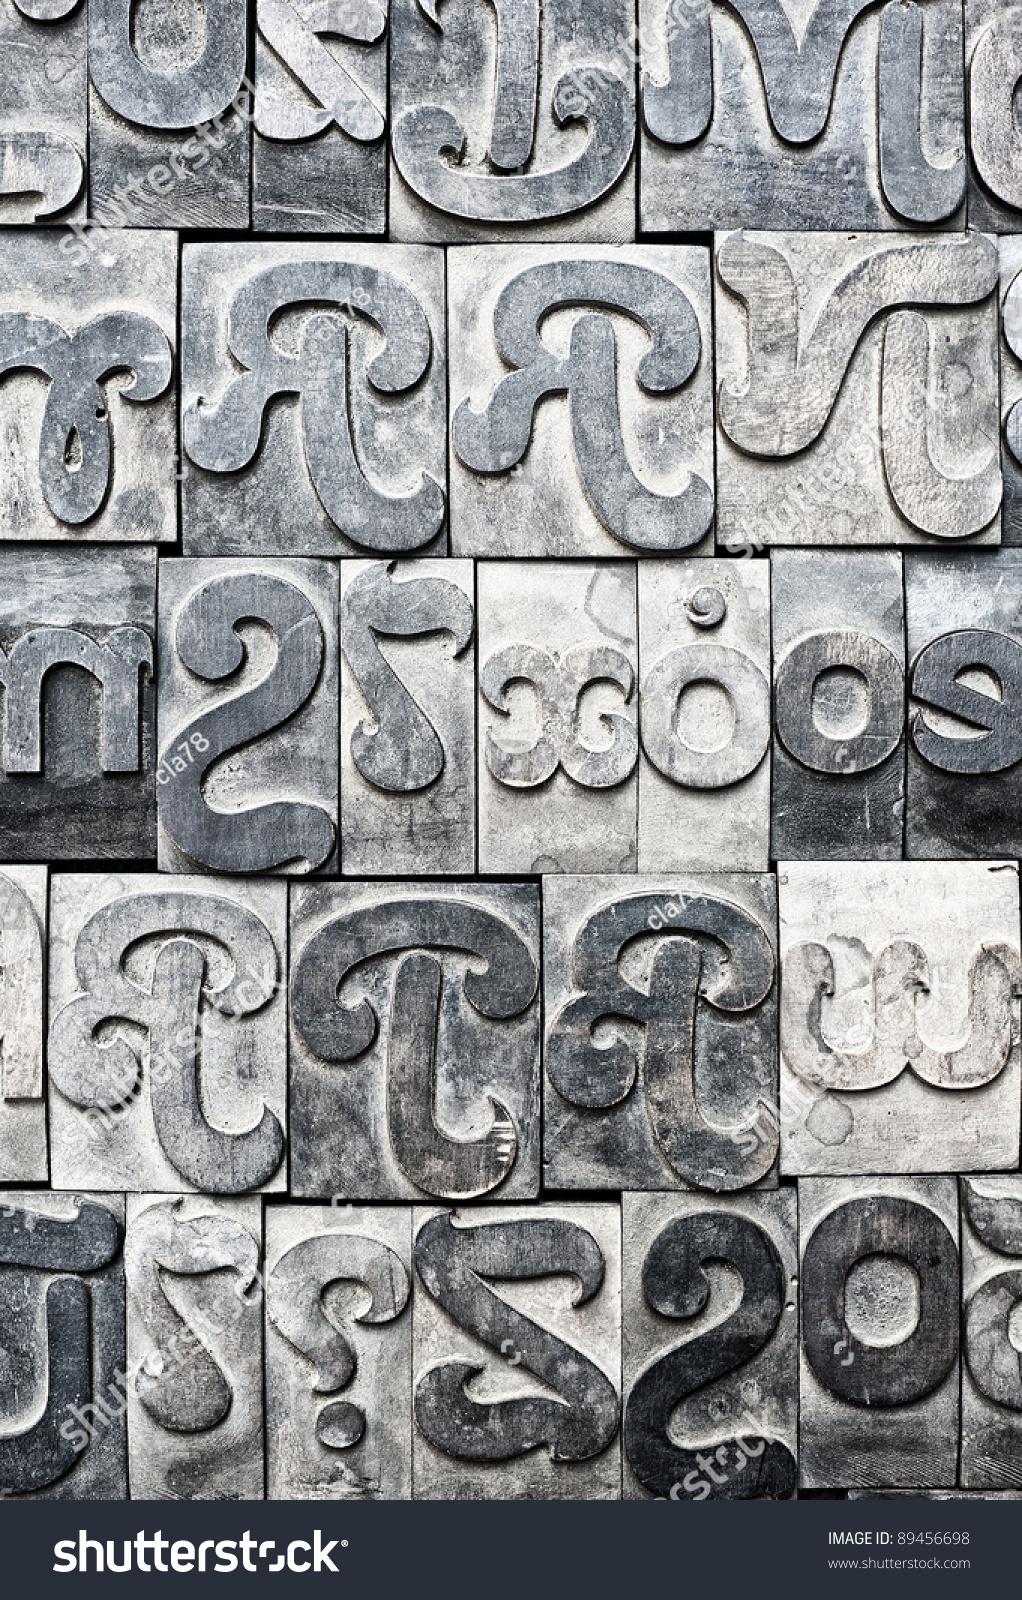 Metal Block Letters Many Metal Block Letters Stock Photo 89456698  Shutterstock